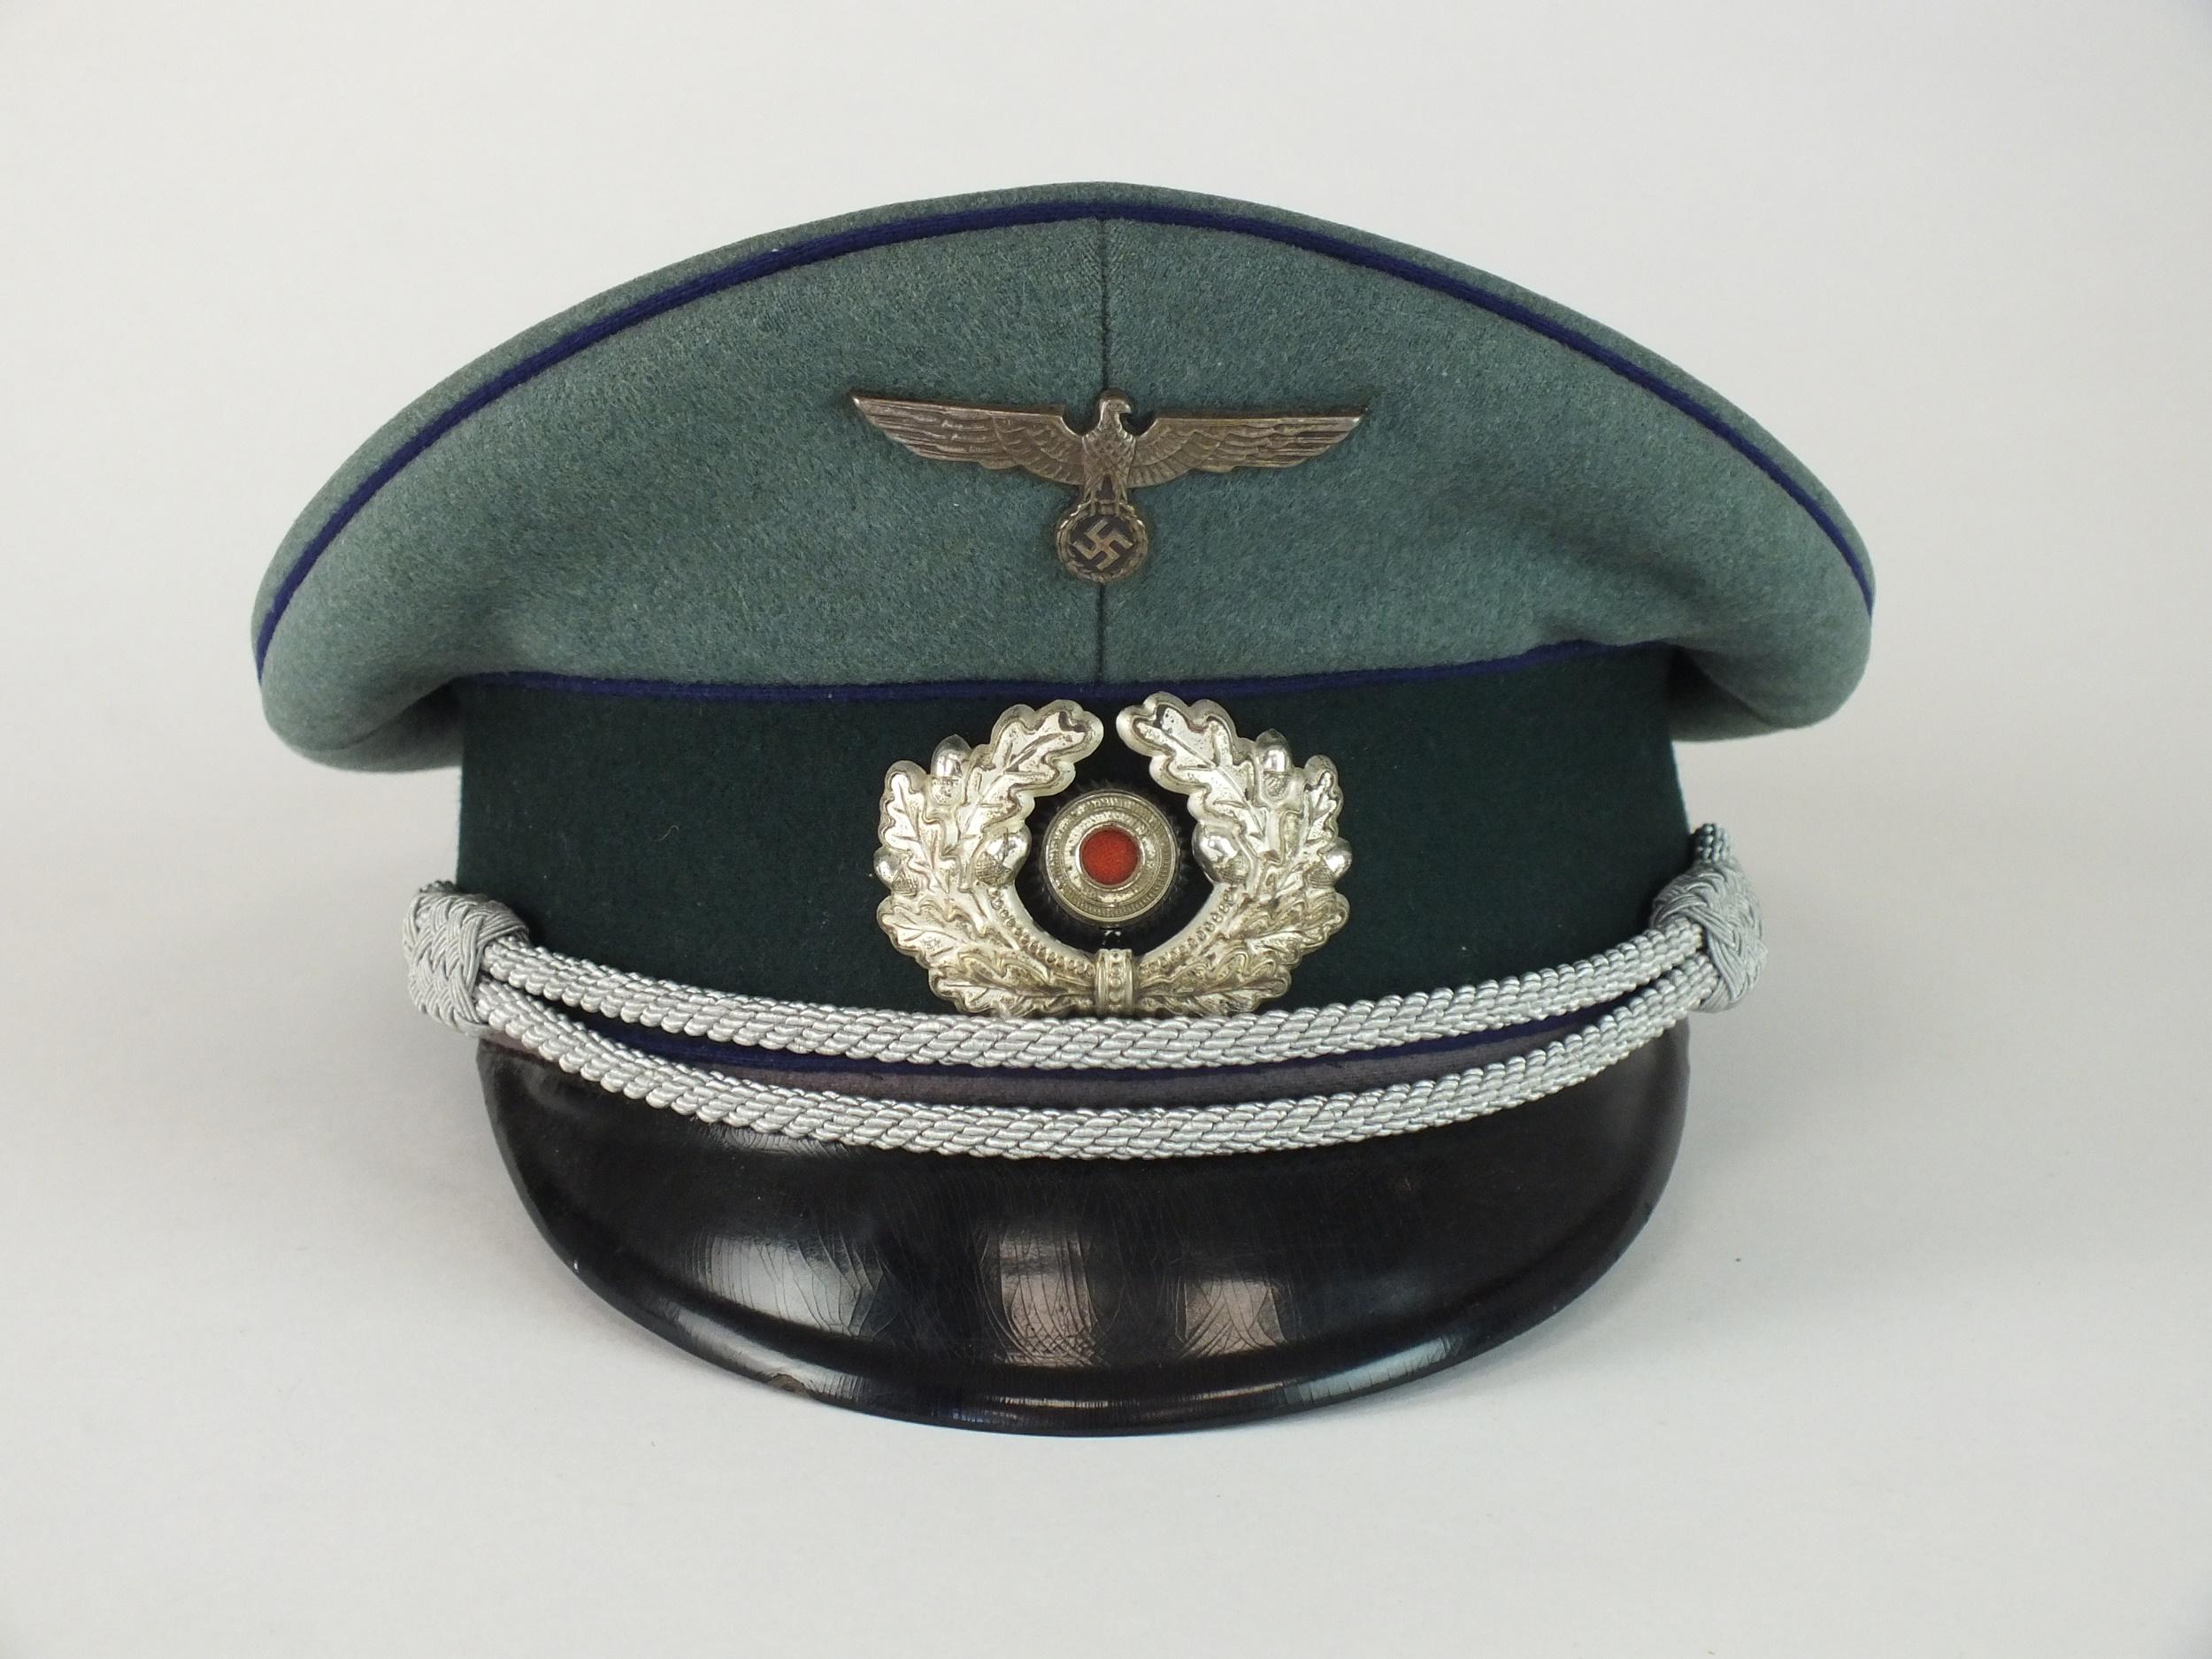 German Third Reich Army Medical Officer's visor